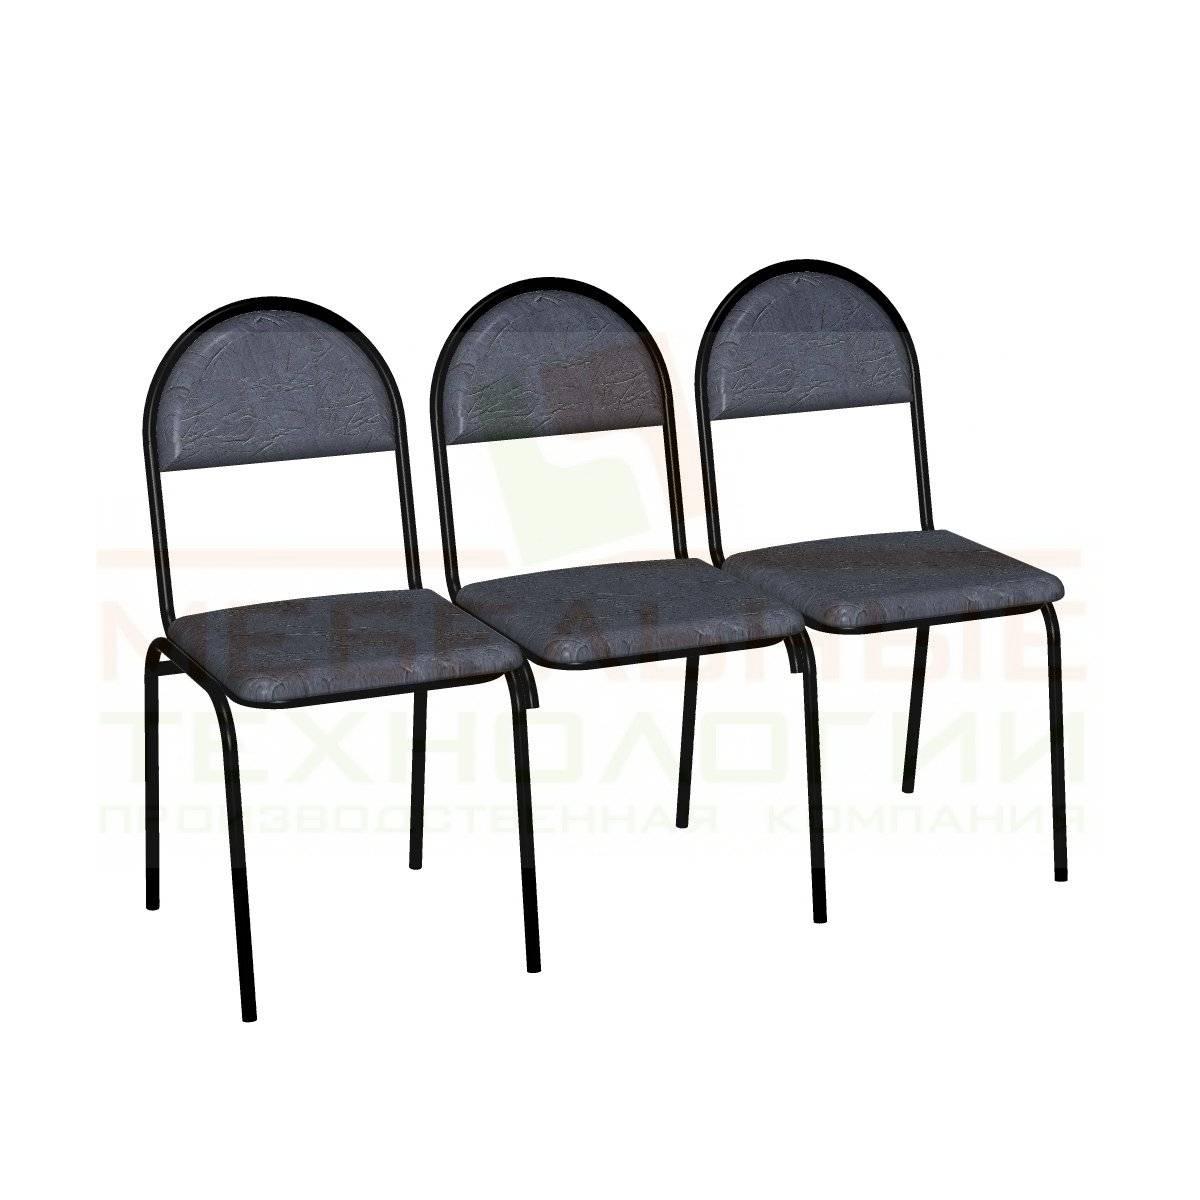 Блок стульев Стандарт МТ 05-15